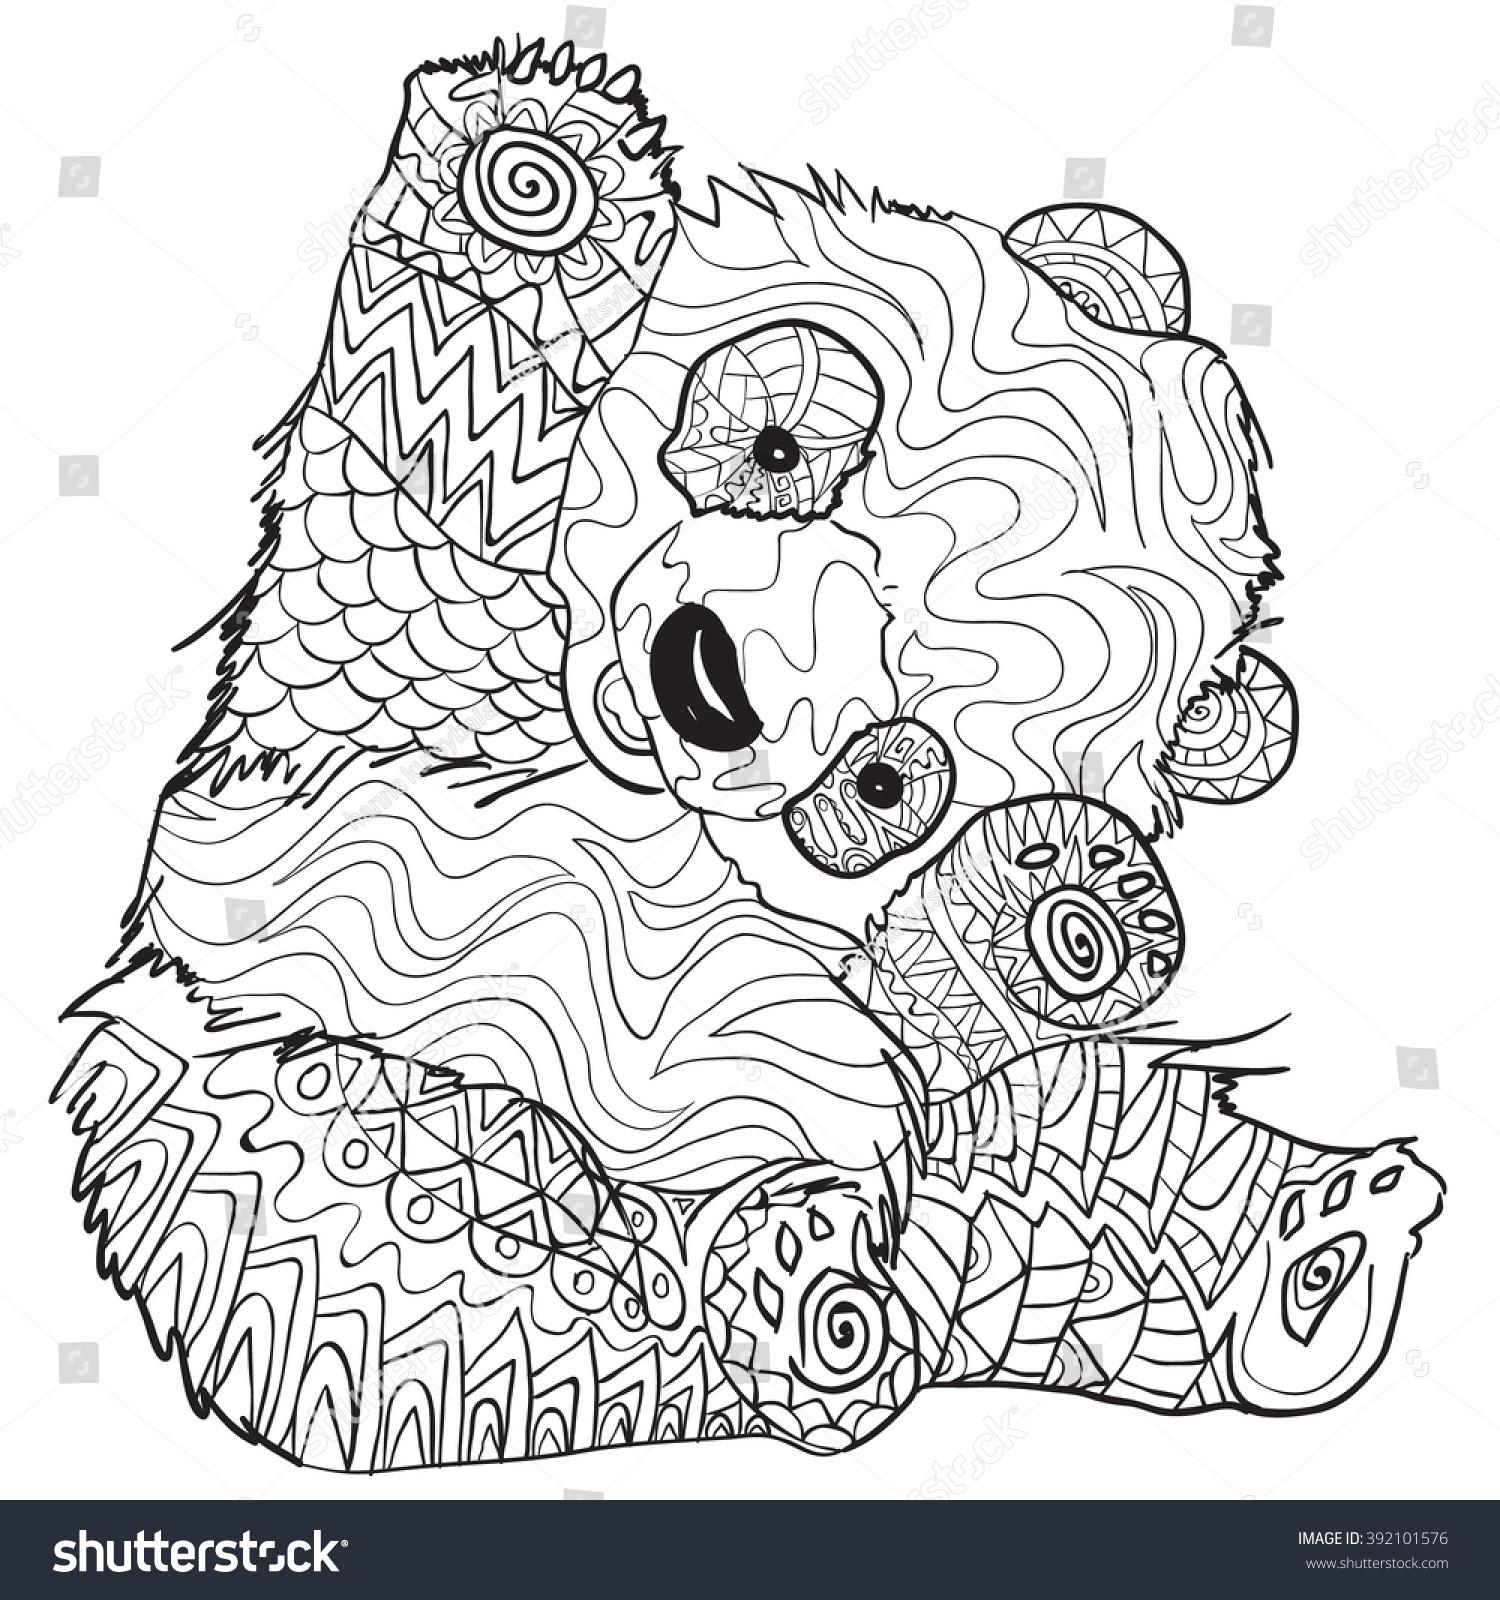 Hand Drawn Coloring Pages Panda Illustration Stock Vector